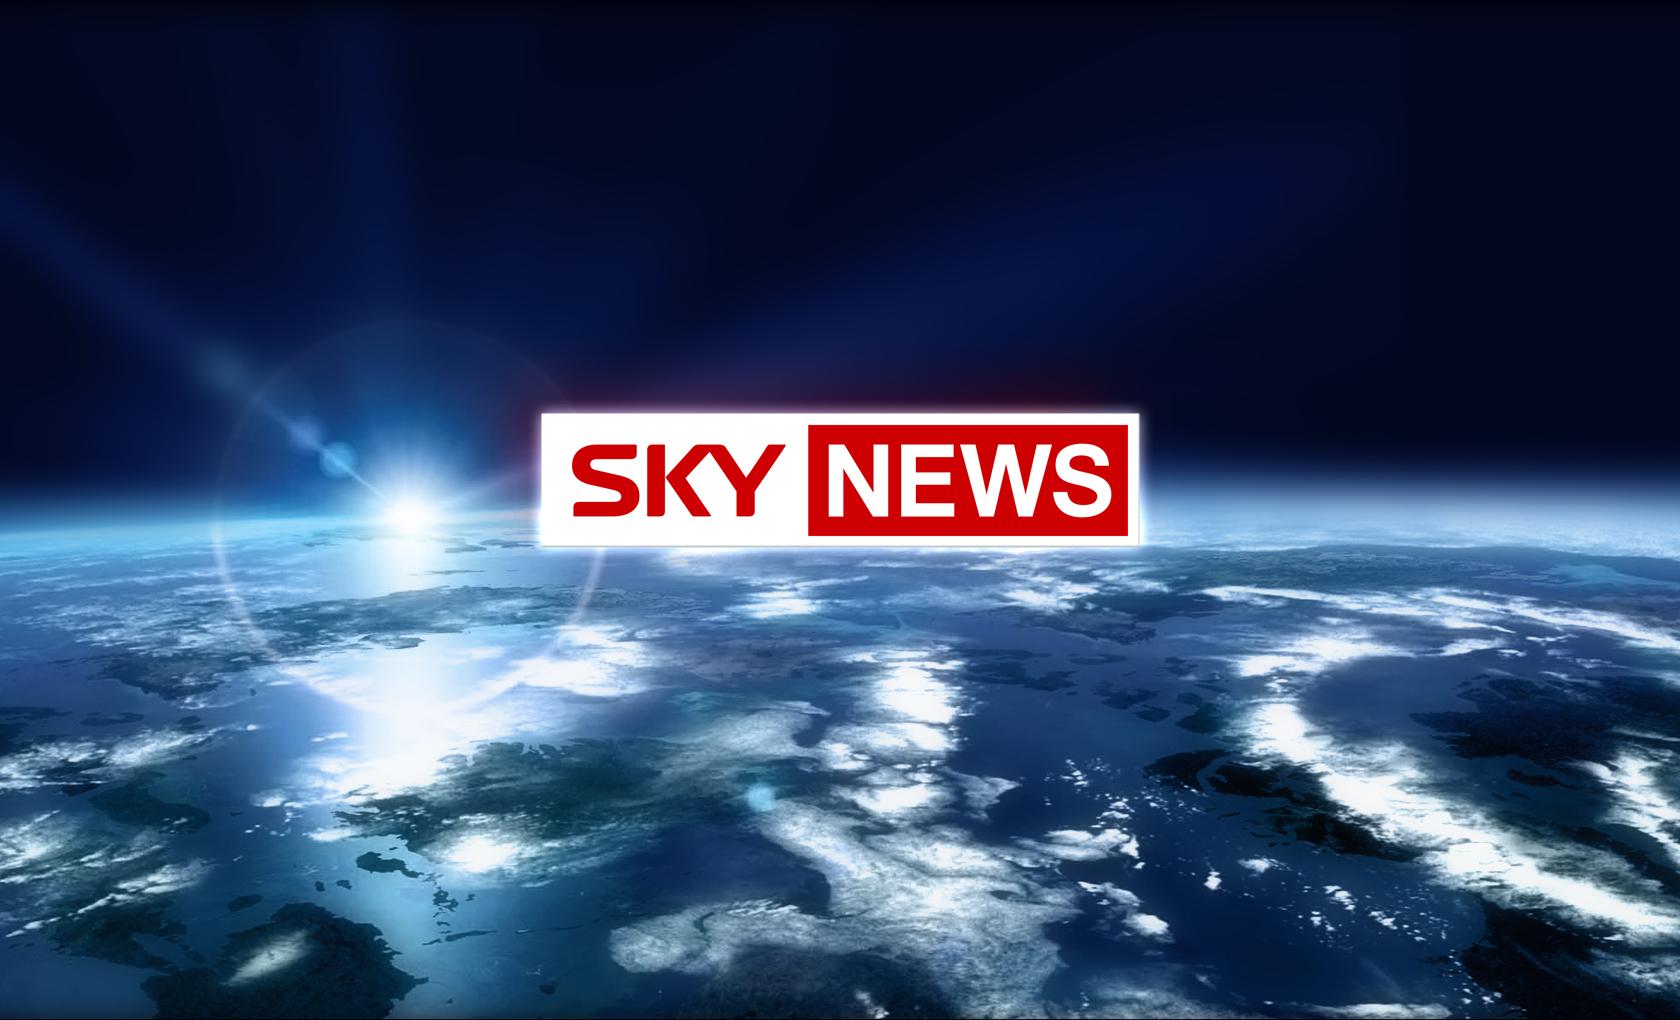 skynews-16-9